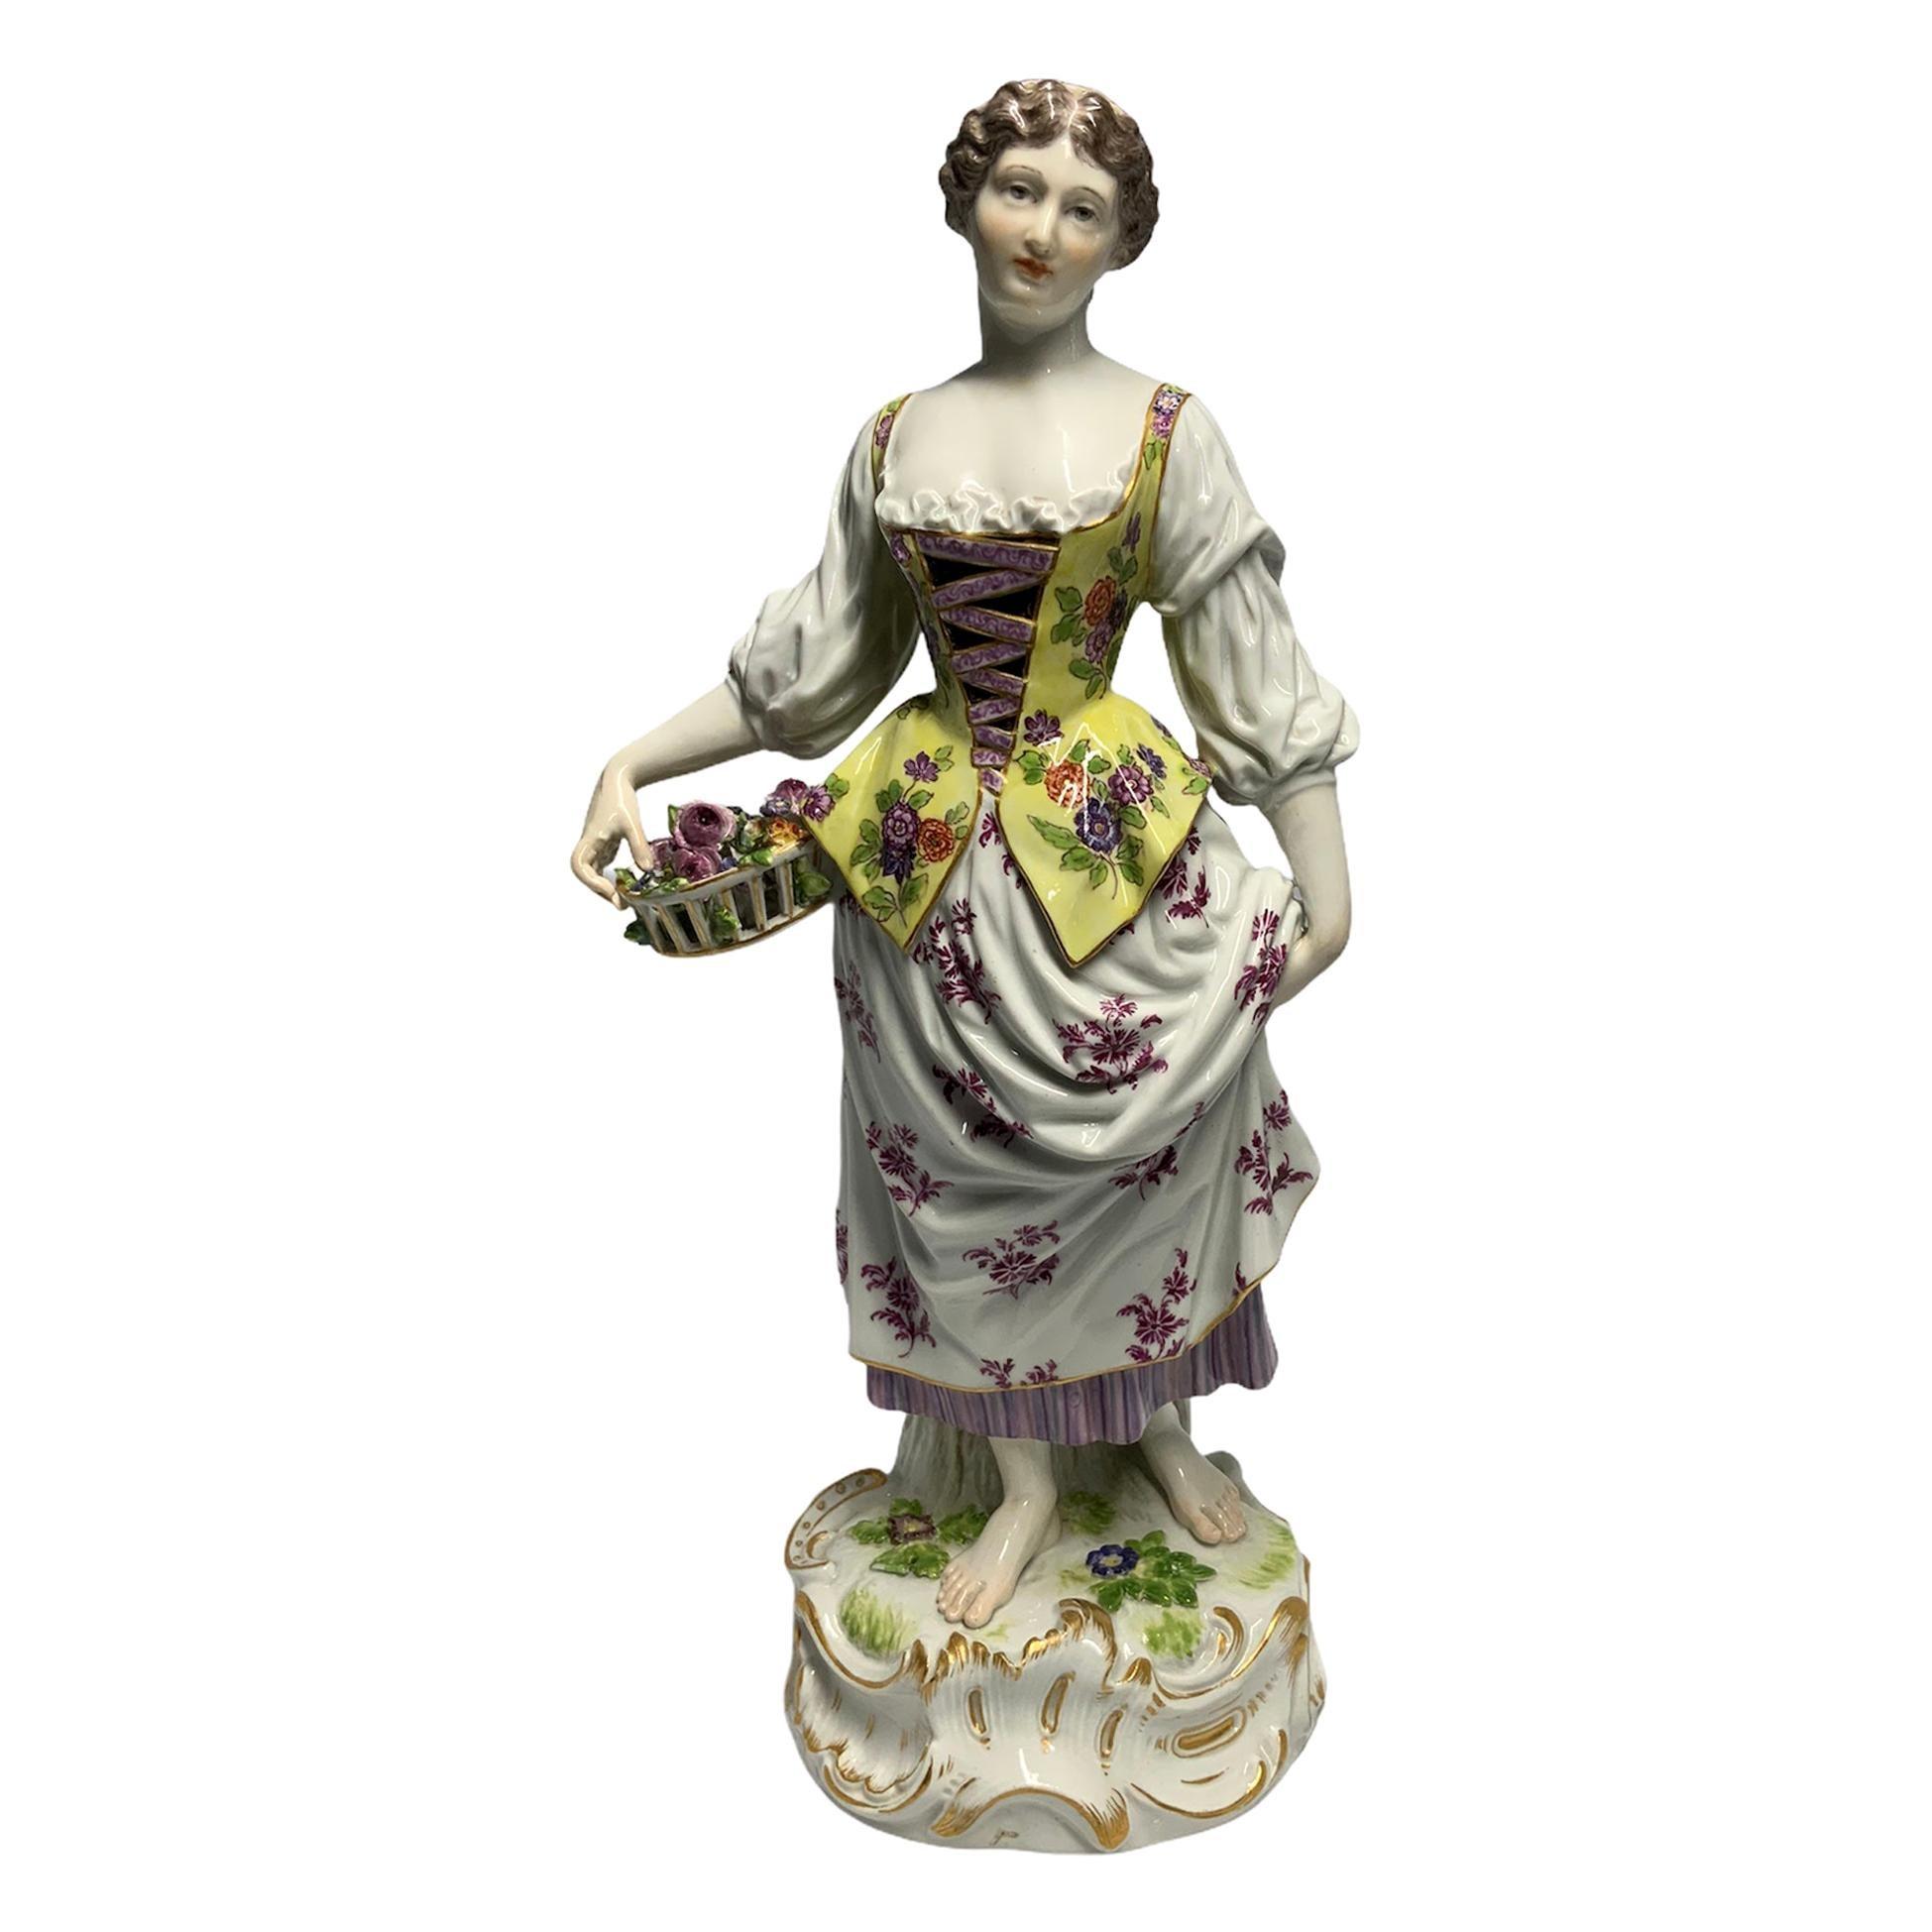 Meissen Porcelain Shepherdess Sculpture